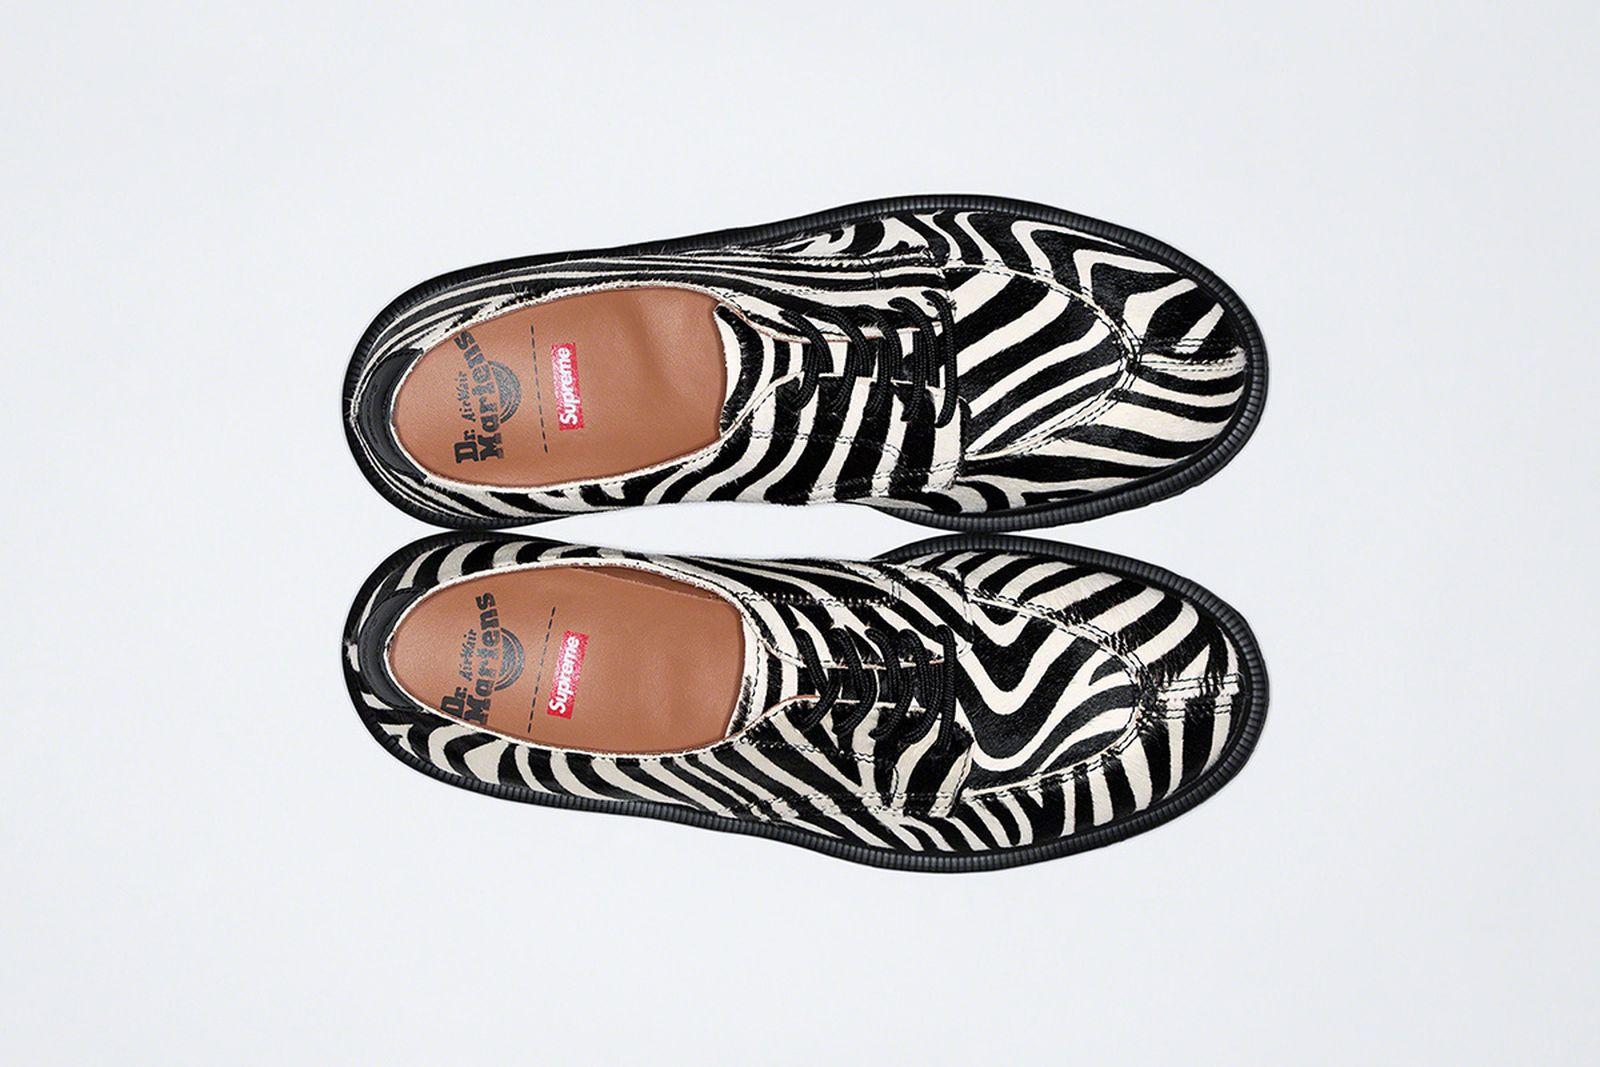 supreme-dr-martens-5-eye-shoe-release-date-price-08